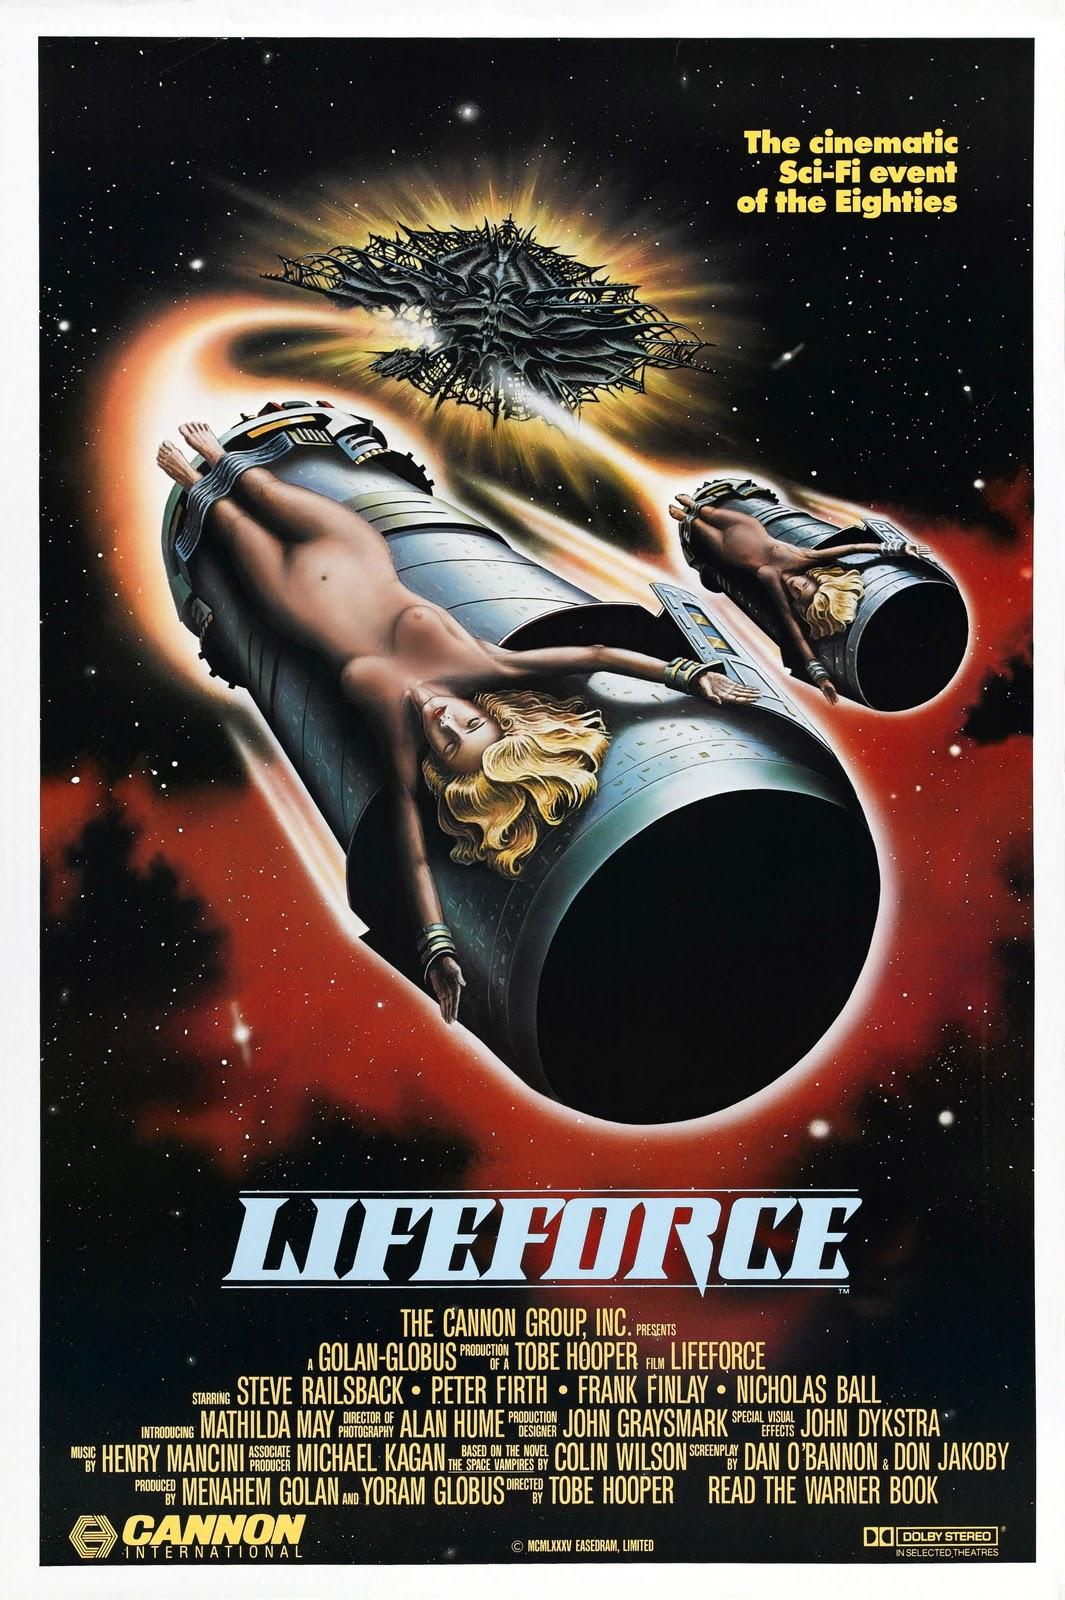 http://1.bp.blogspot.com/--9AakfrlHI4/TZNgTK5_TgI/AAAAAAAABeo/9noSsivGbto/s1600/lifeforce_poster_01.jpg